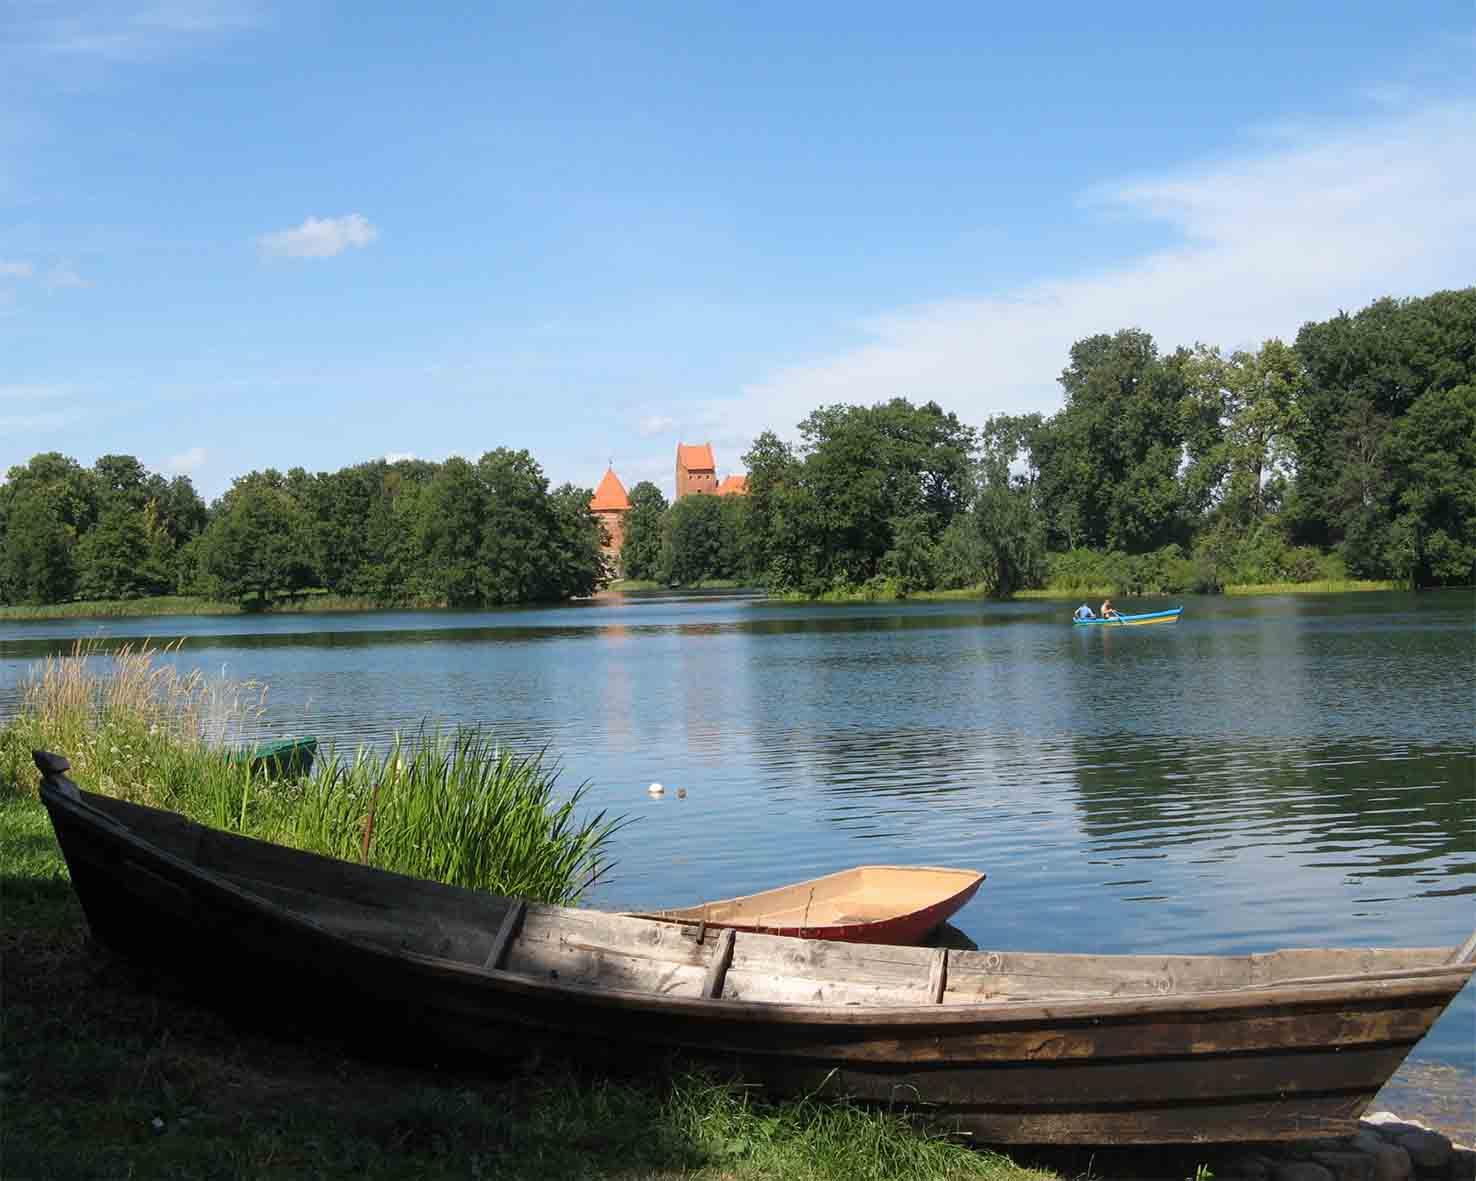 Radreise Baltikum, IB, Fot. 2